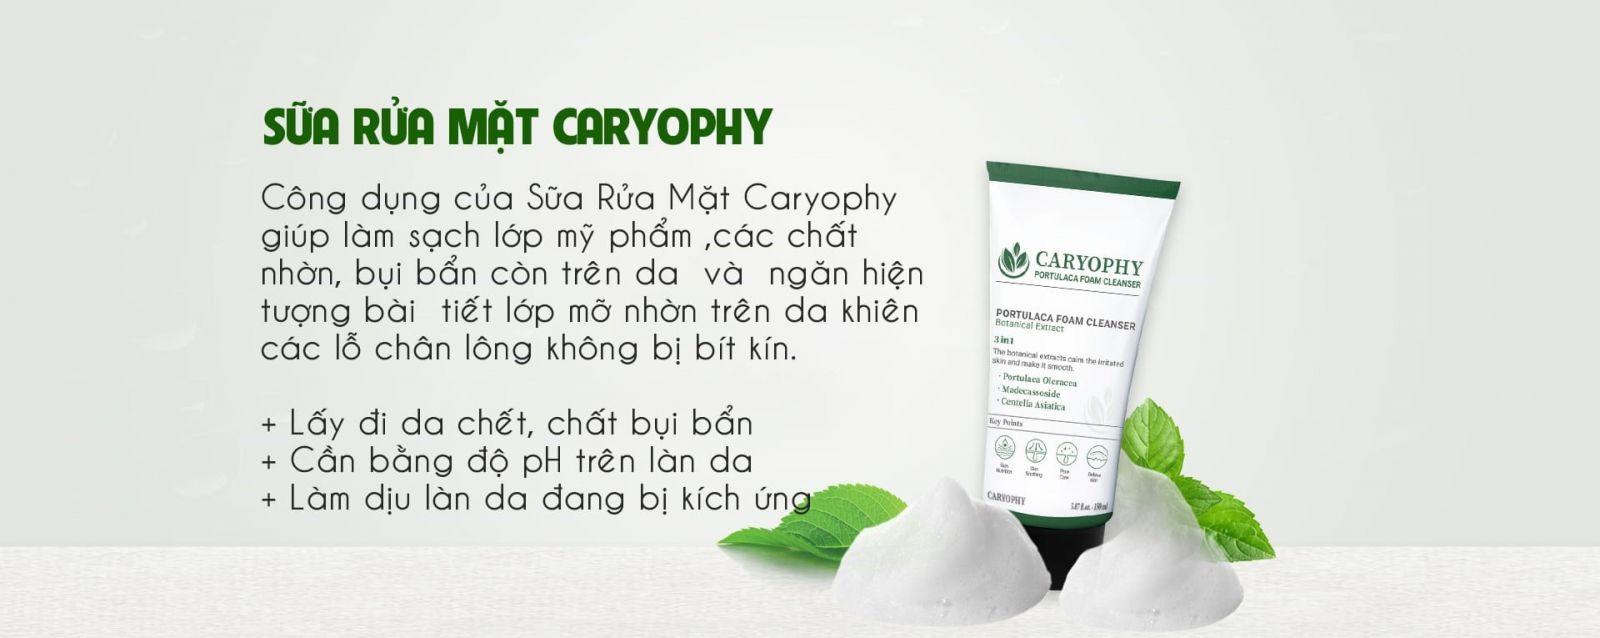 review sua rua mat Caryophy cong dung